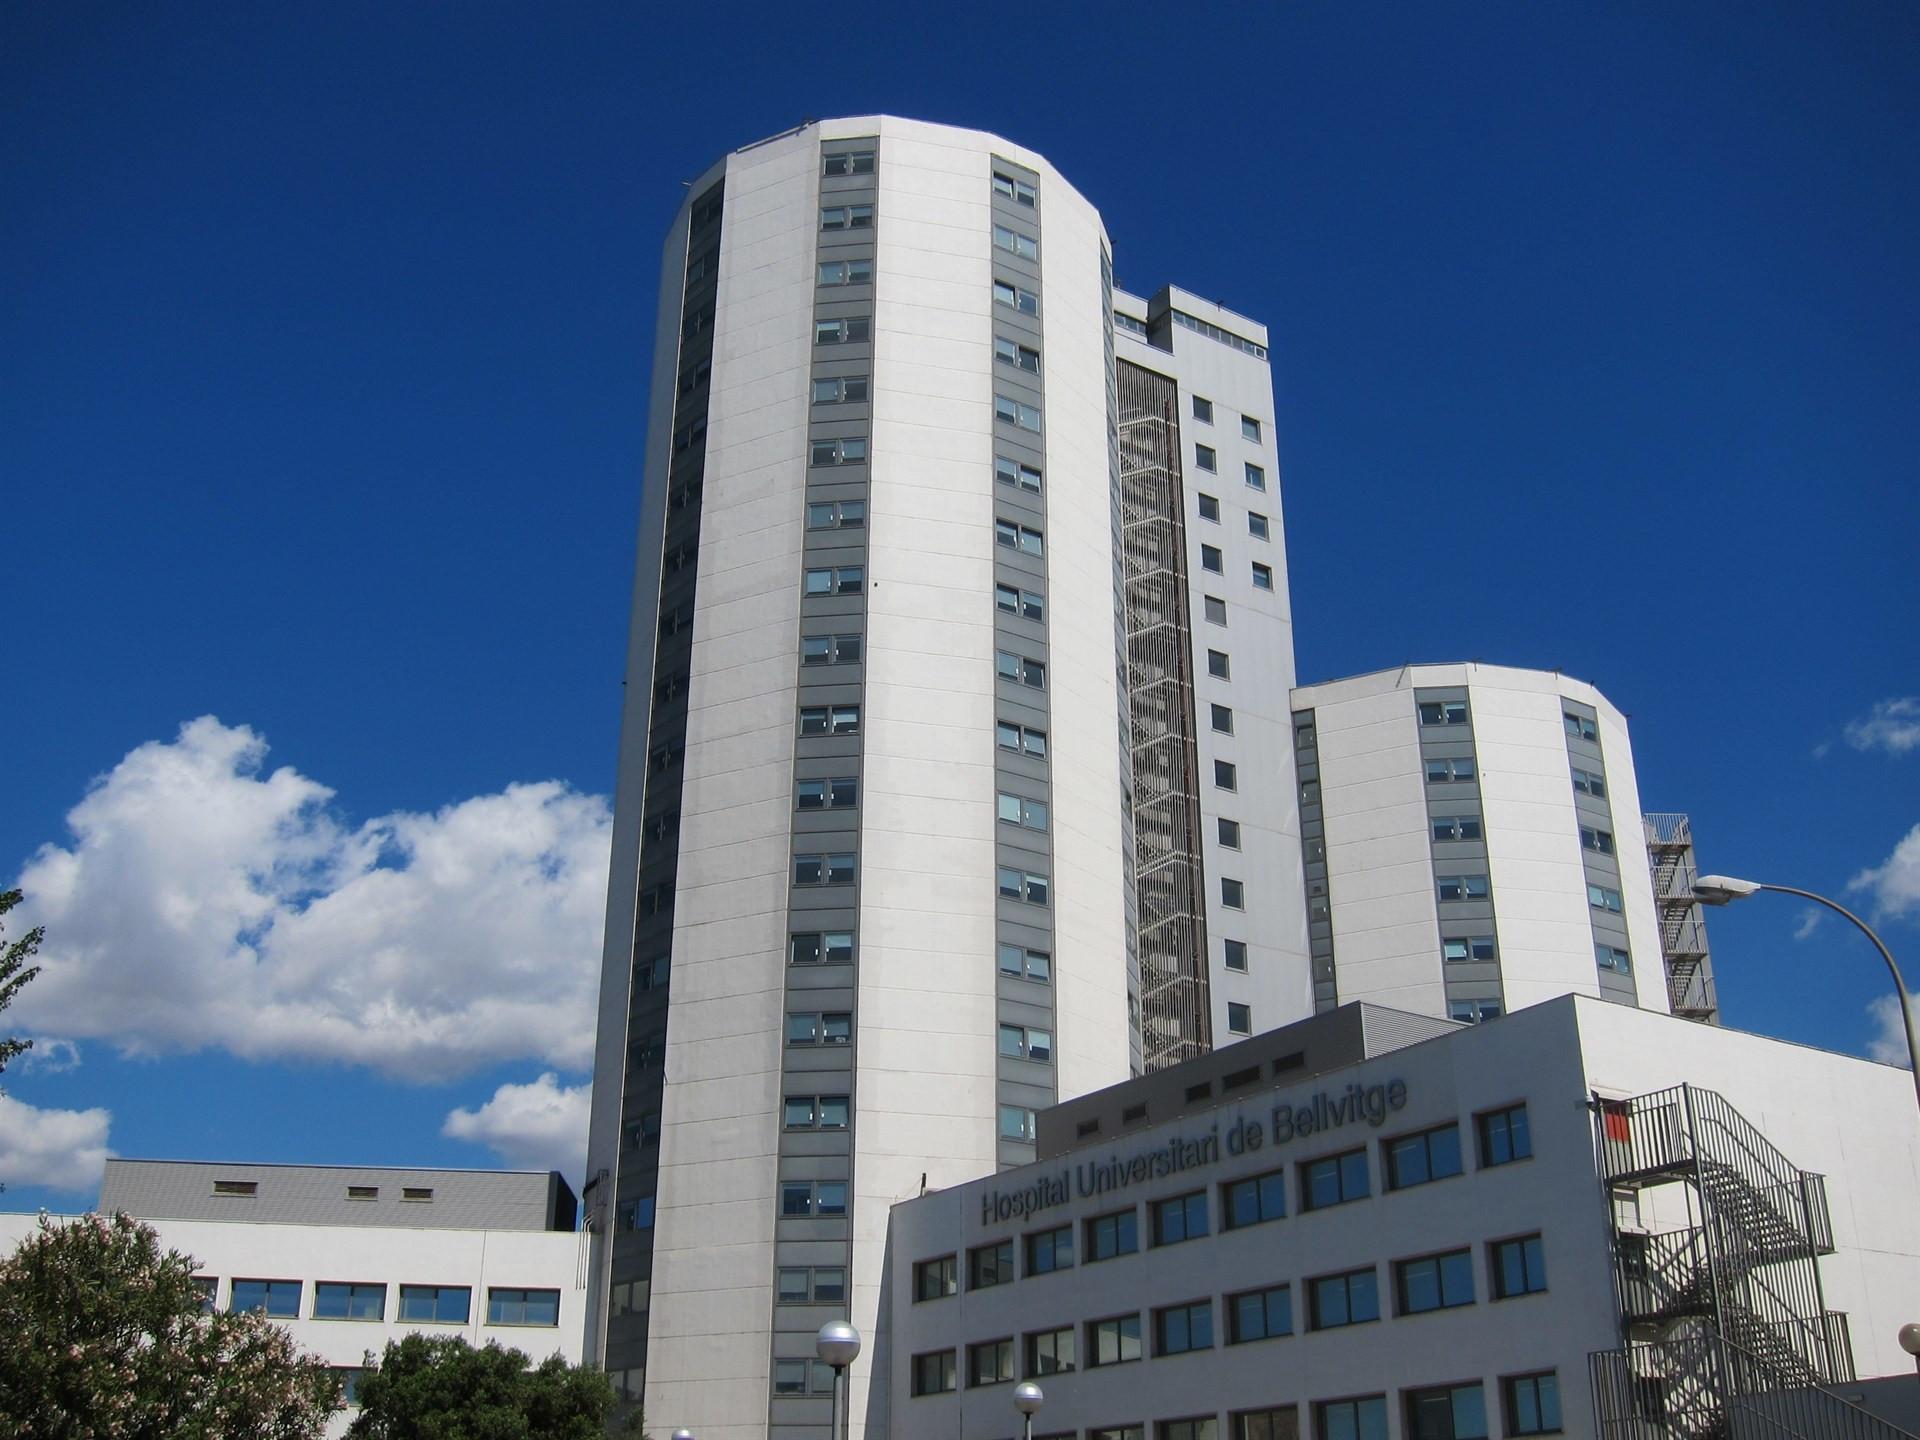 Hospitaldebellvitge